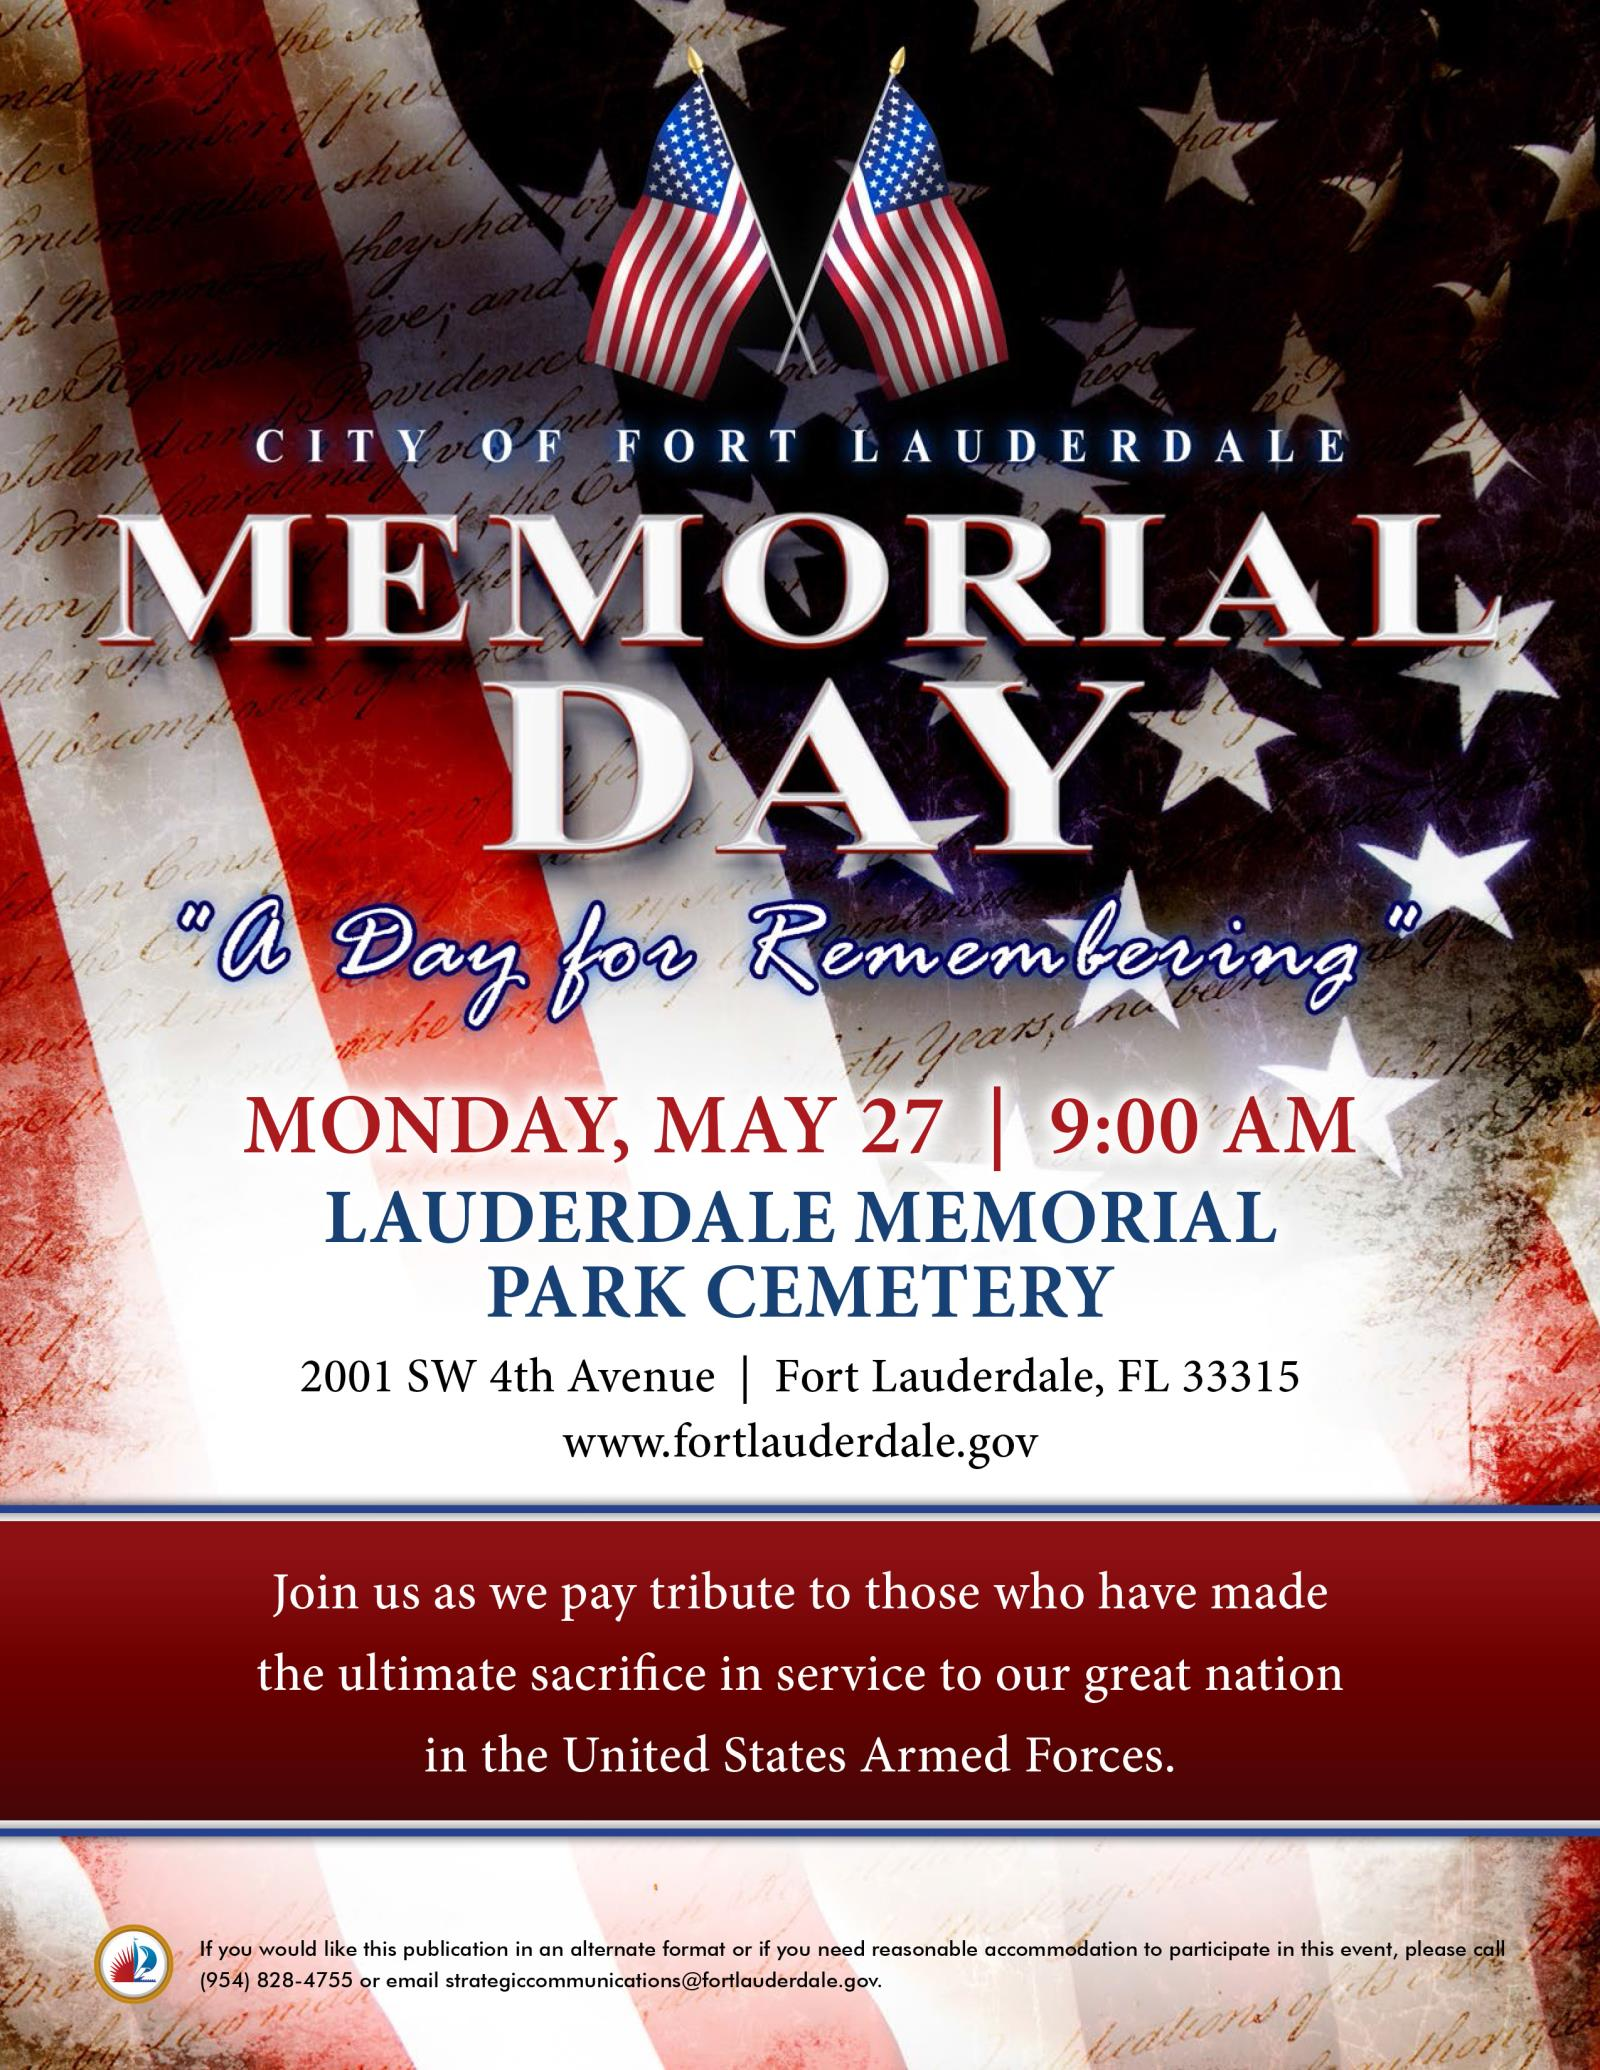 City of Fort Lauderdale, FL : Custom News &